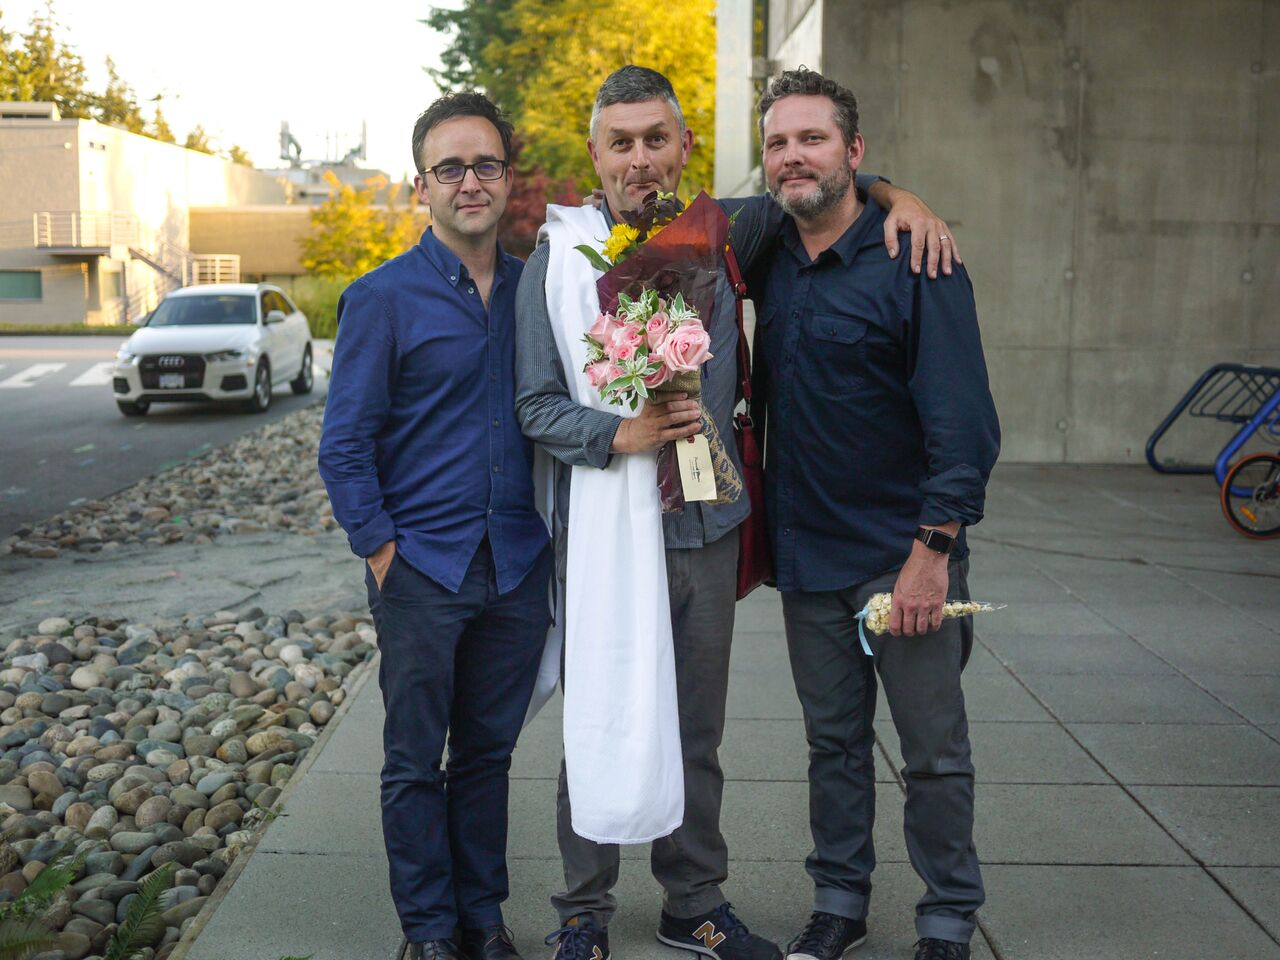 Matthew Griffiths, Gareth Moses, Christian Allen